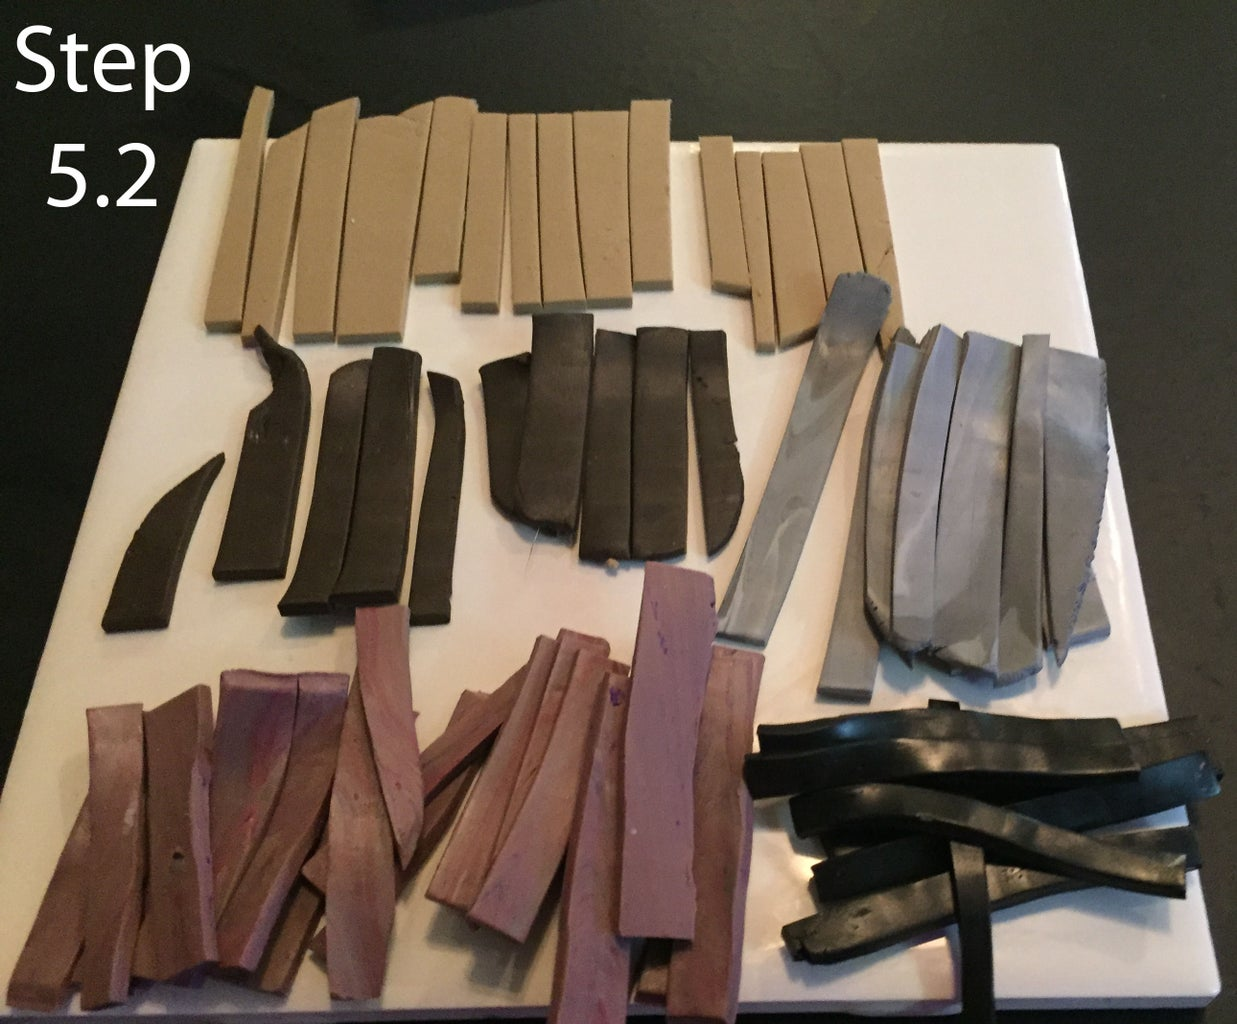 Creating the Wood Grain